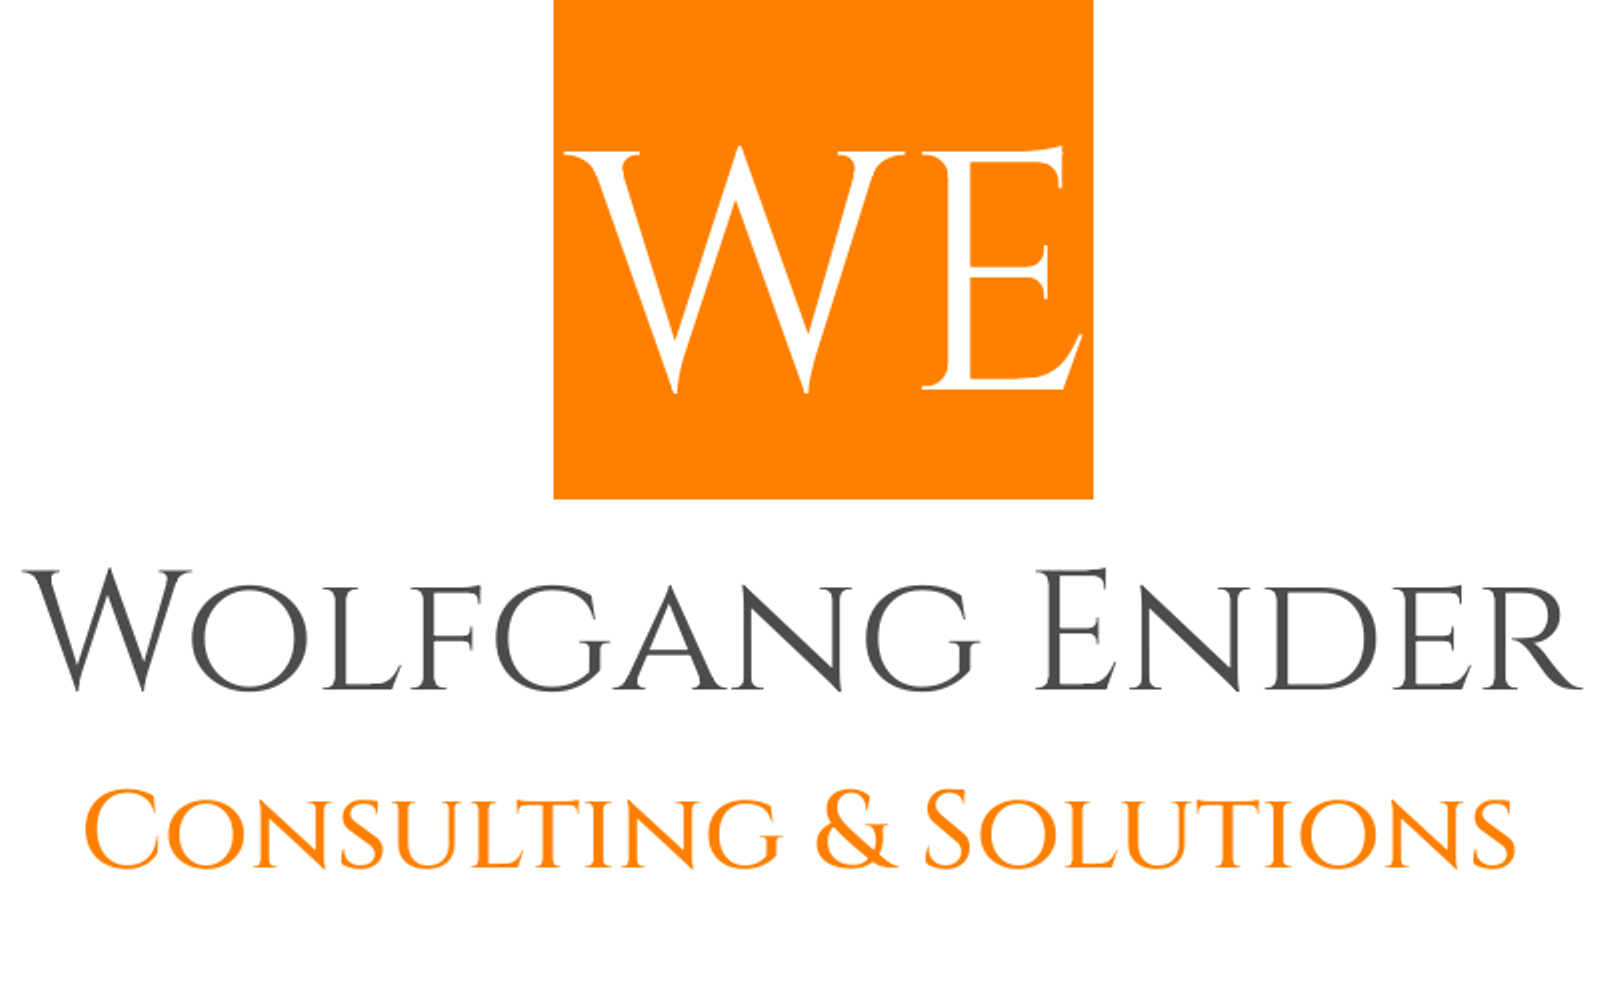 WE Logo L orange 600dpi